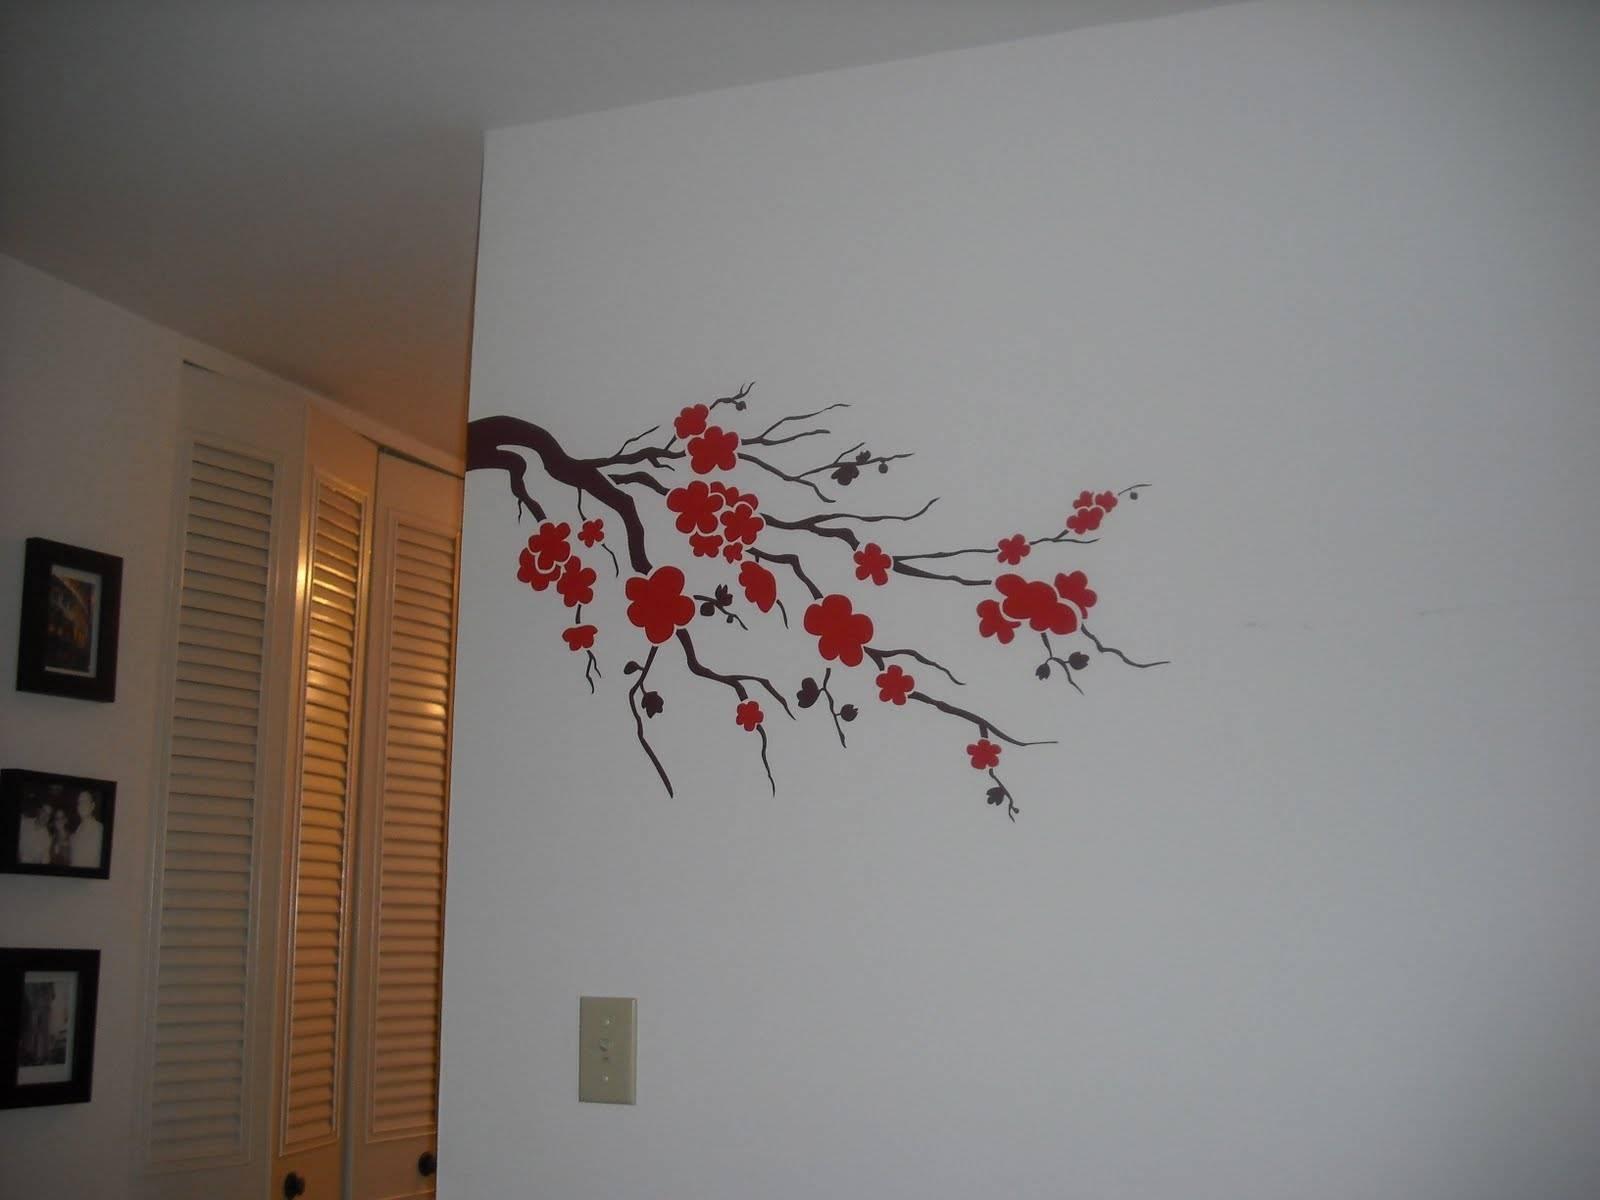 Bedroom : Bedroom Paint Ideas Wrought Iron Wall Art Wall Decor Regarding Latest Inexpensive Metal Wall Art (View 3 of 20)